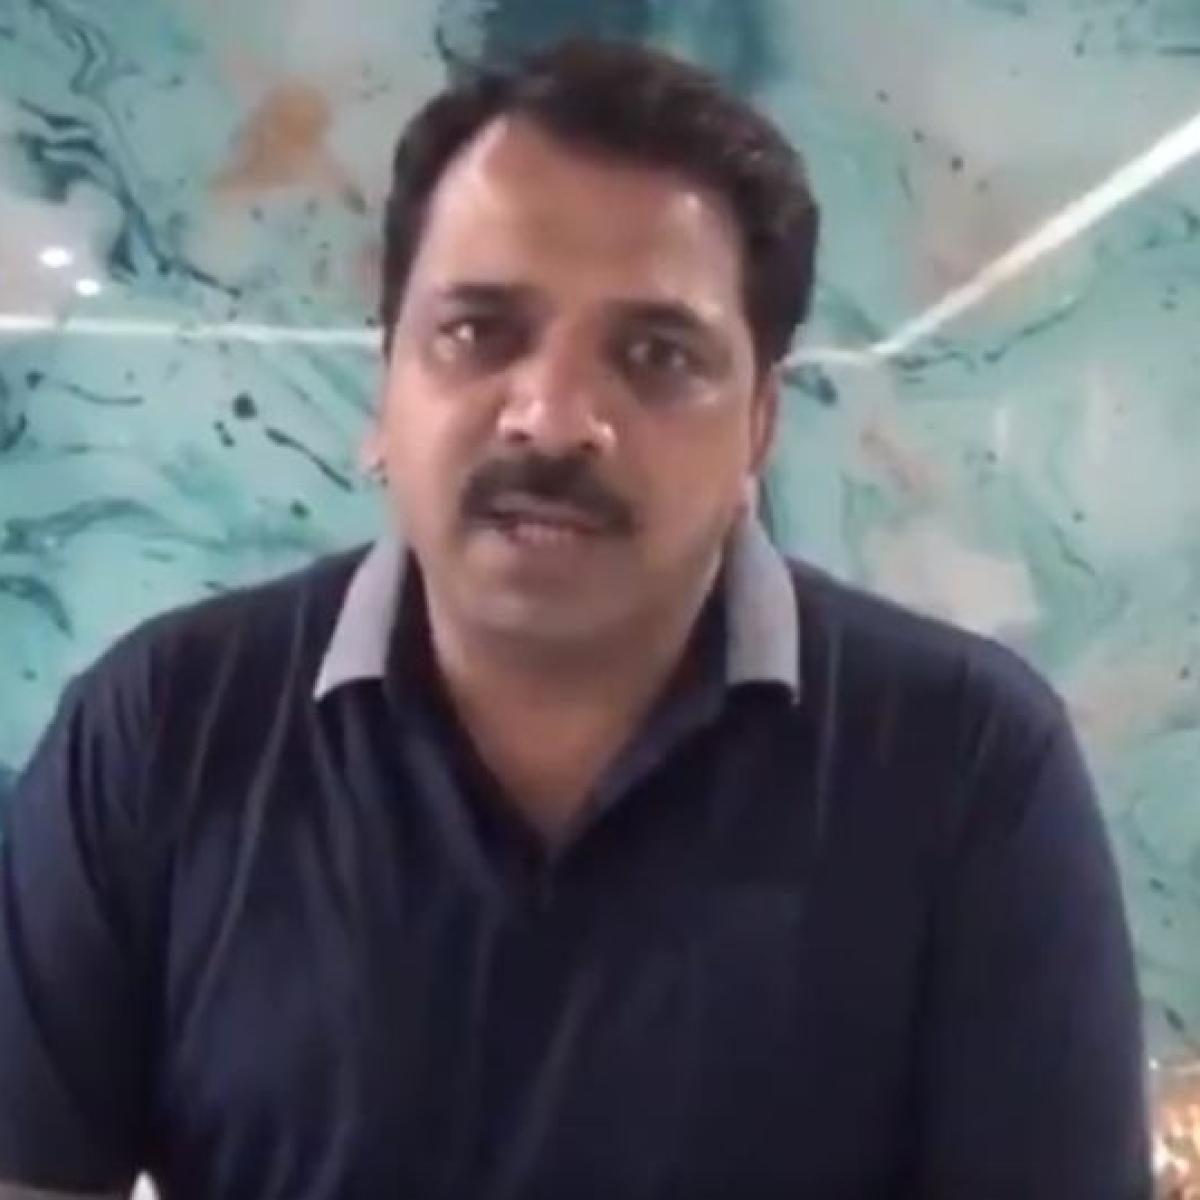 Mumbai: After rape FIR, it's hammer time for former BJP MLA Narendra Mehta